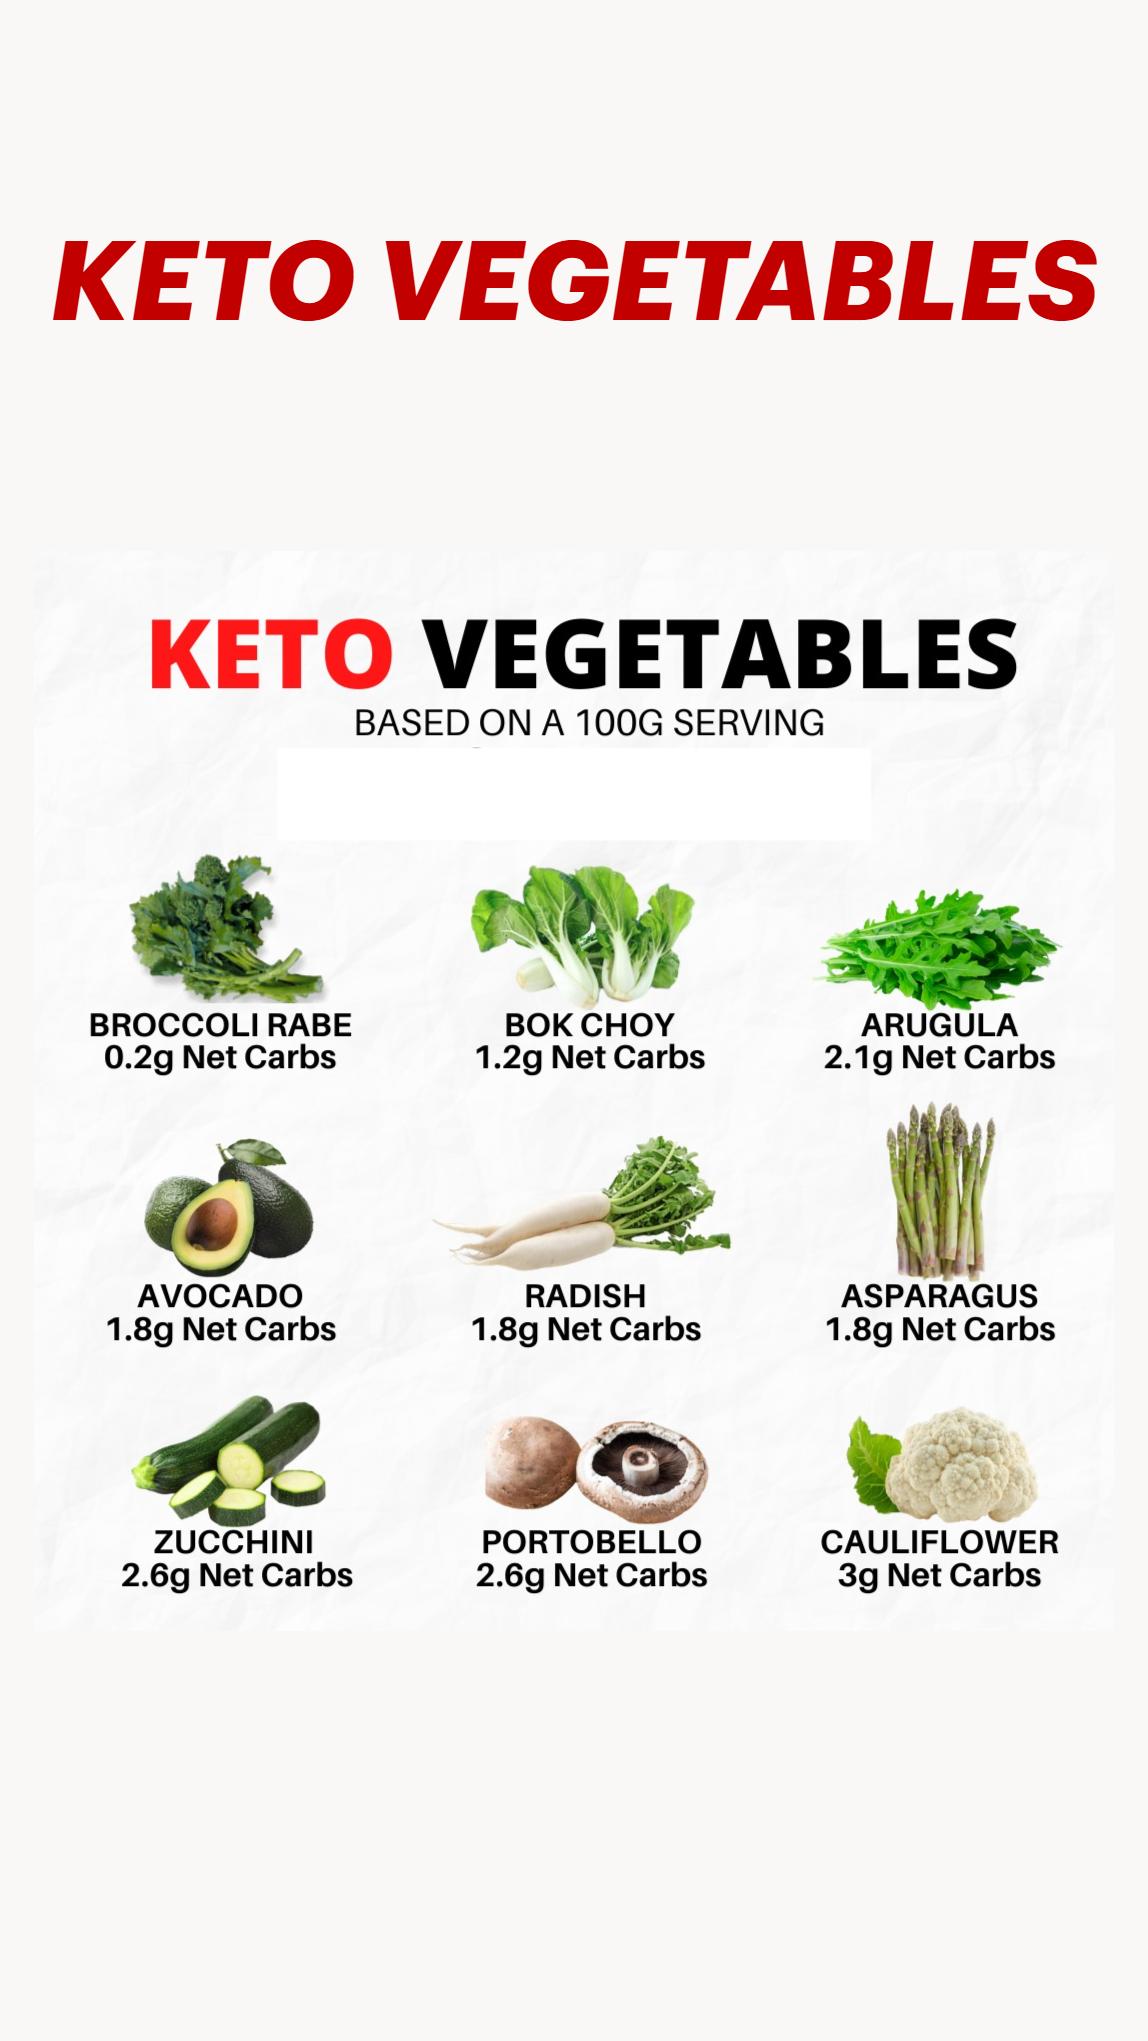 12 KETO VEGETABLES